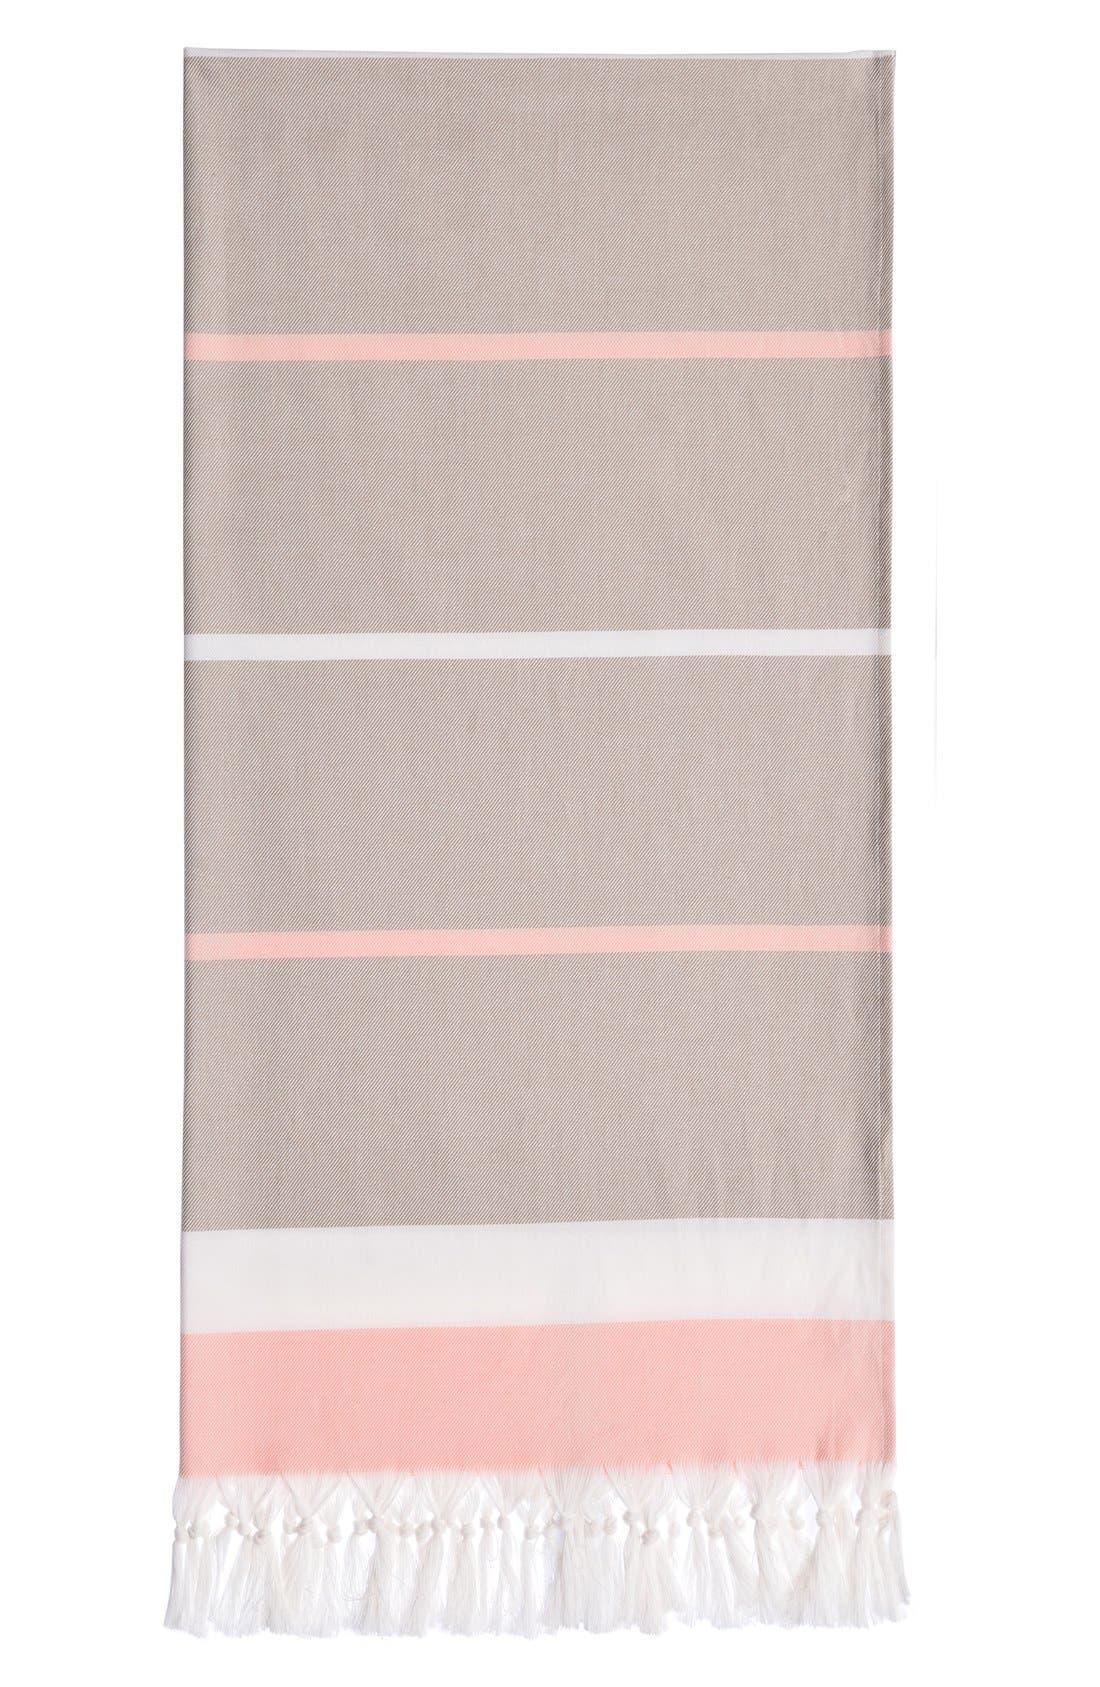 Main Image - Linum Home Textiles 'Seaside Fun' Turkish Pestemal Towel